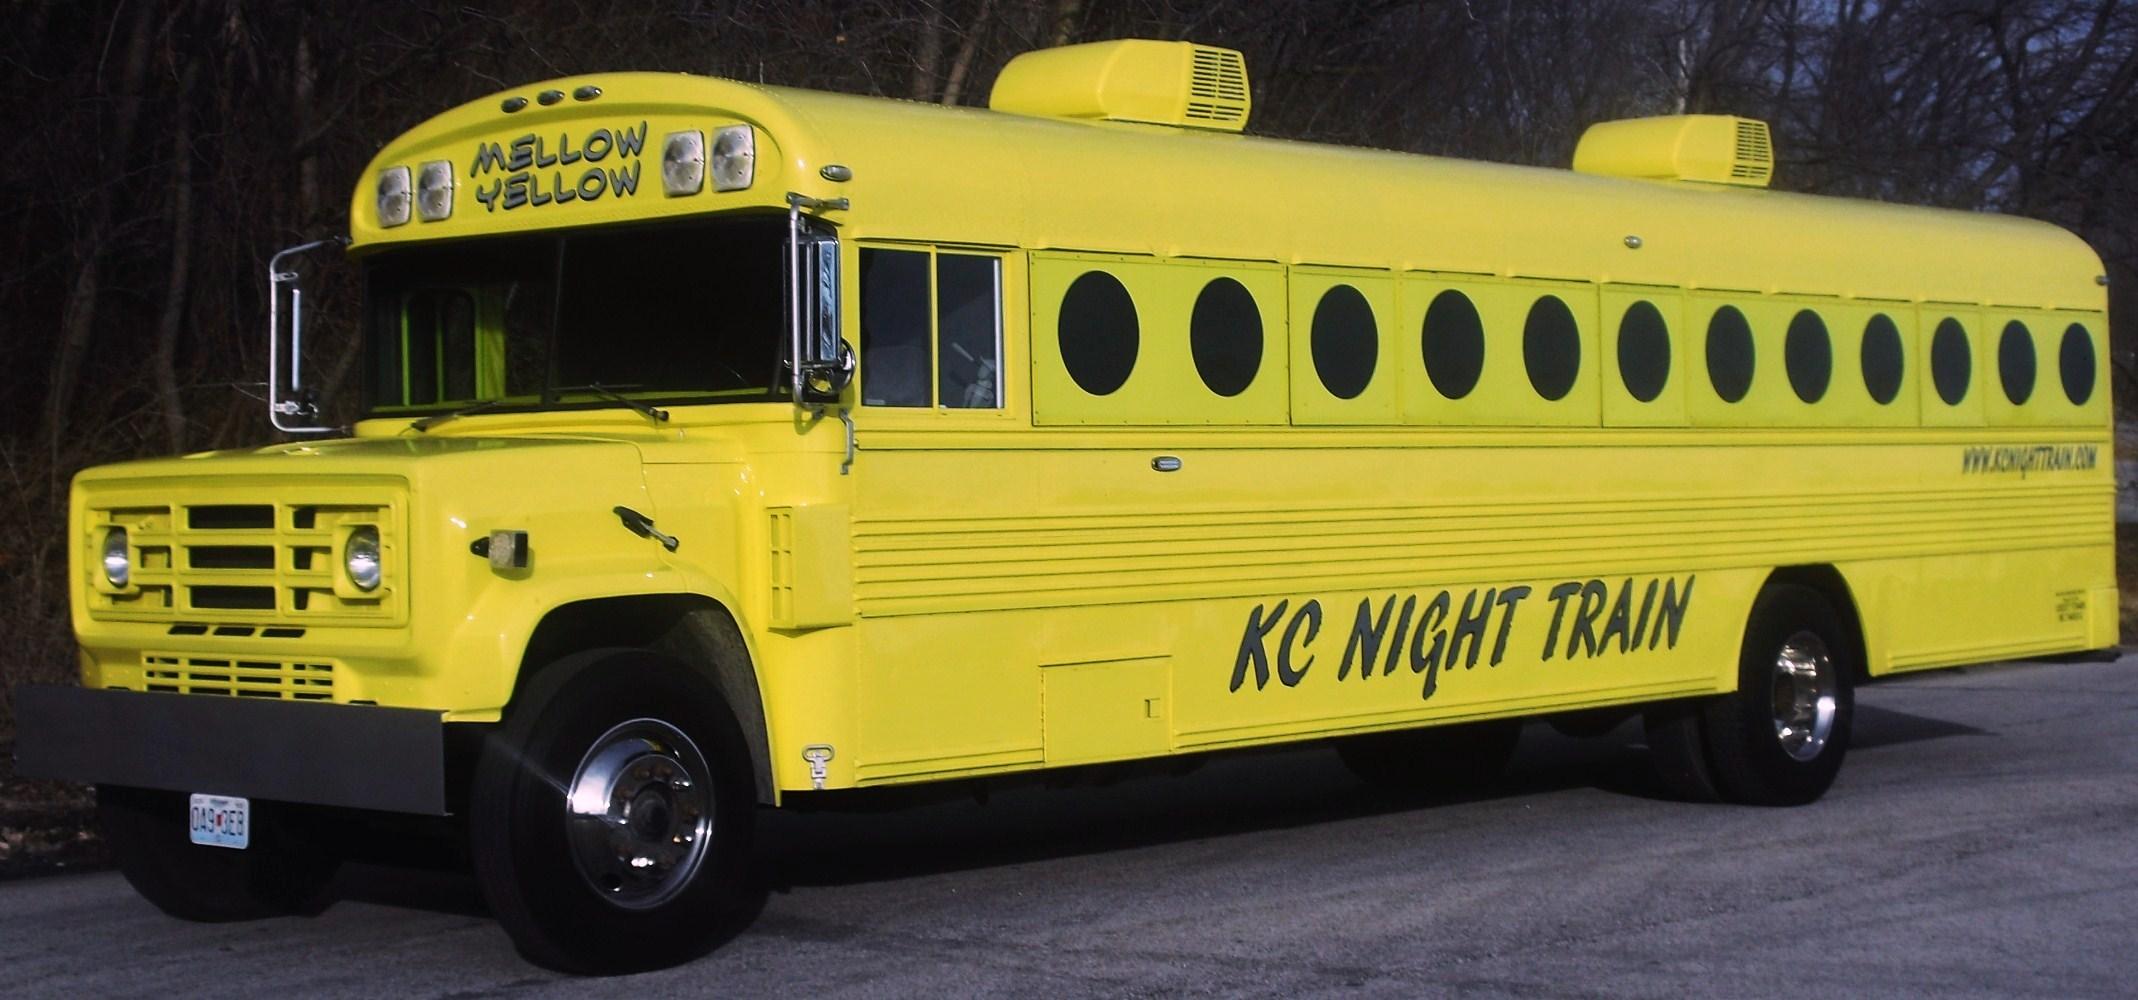 Yellow Party Bus Rental | KC Night Train